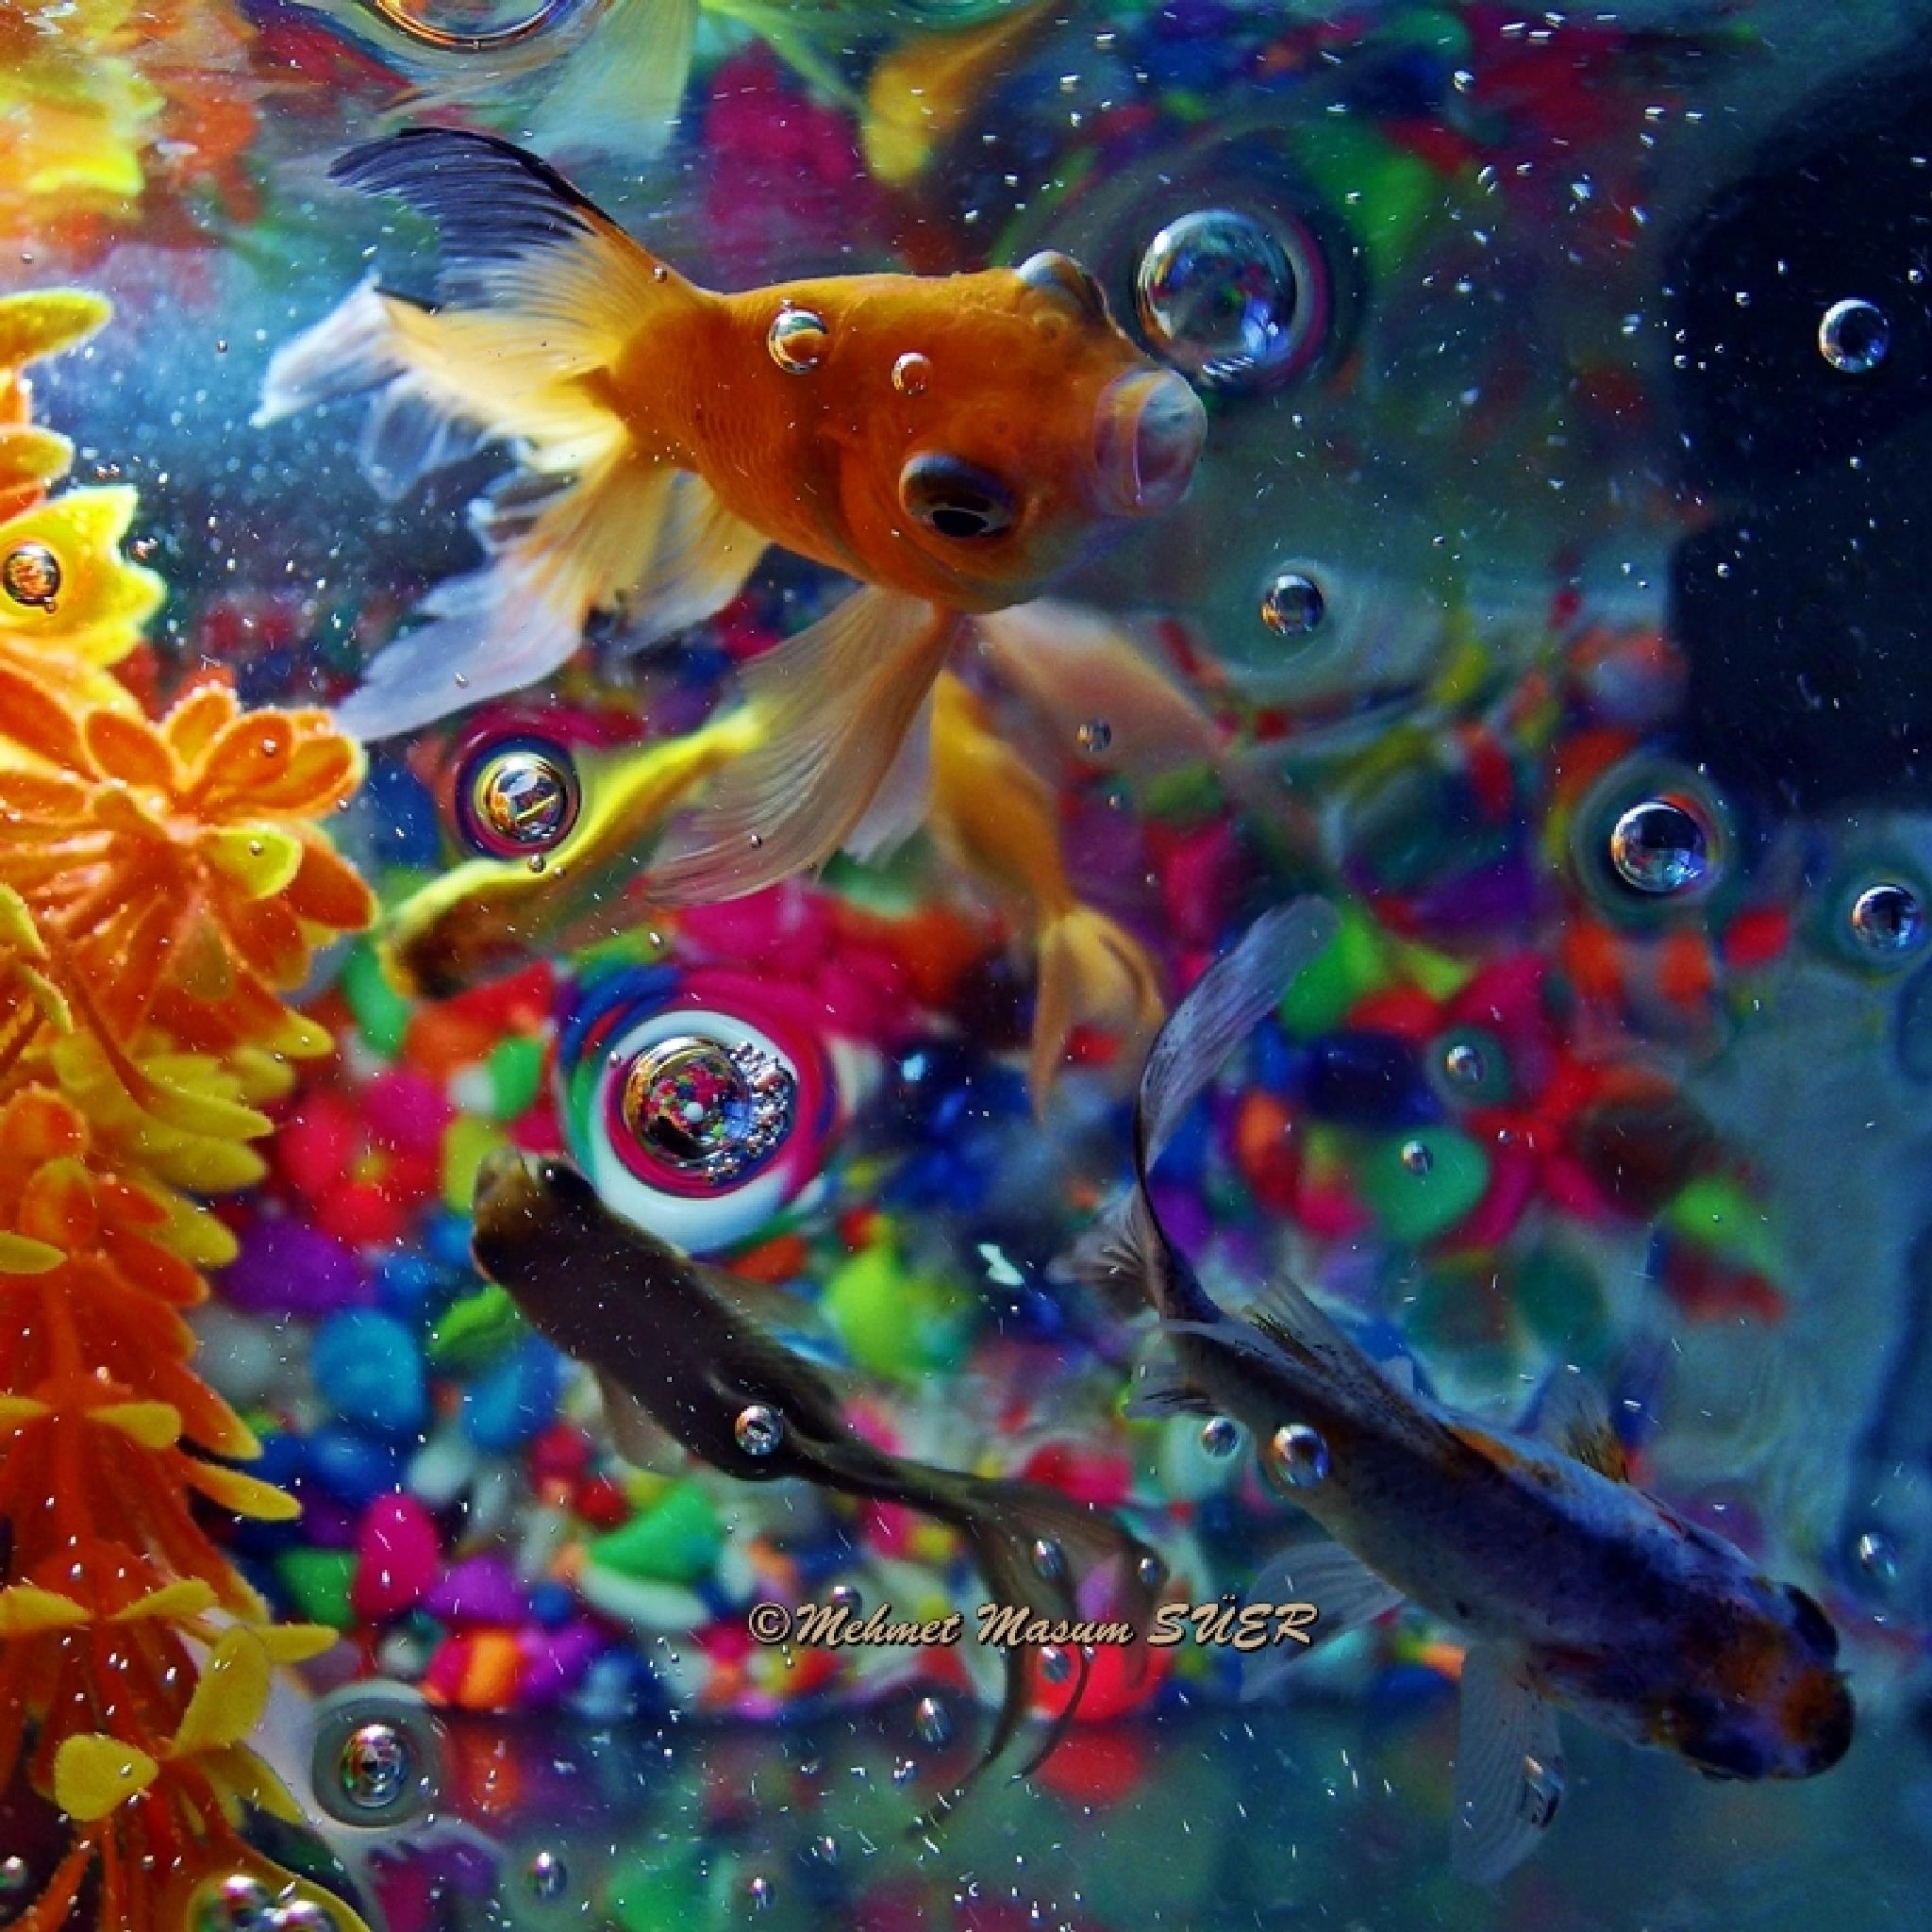 My fishes from aquarium. by Mehmet Masum SUER